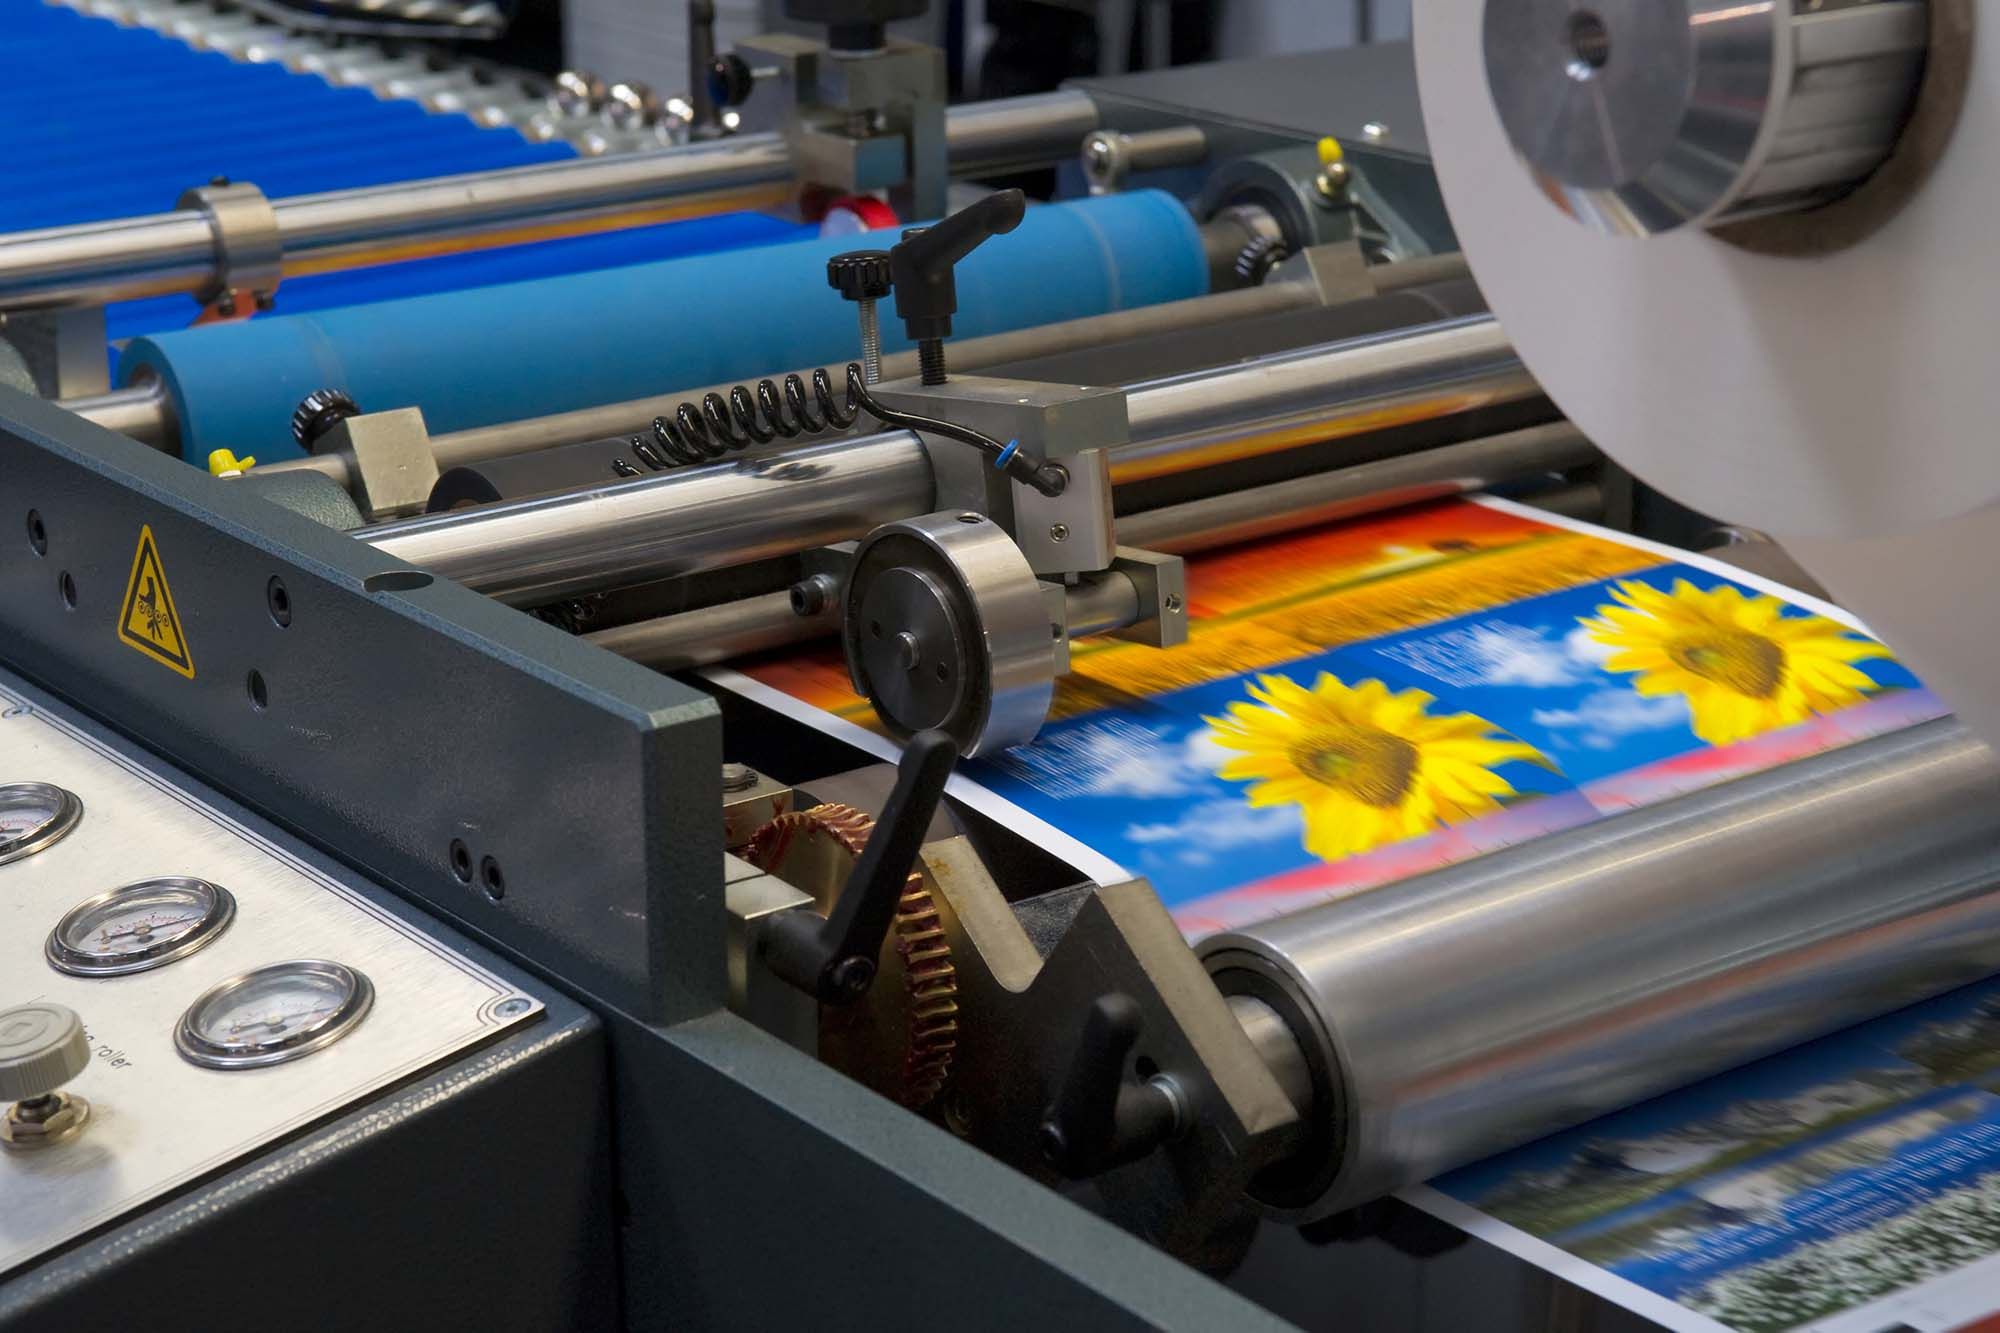 Large rolling printing press